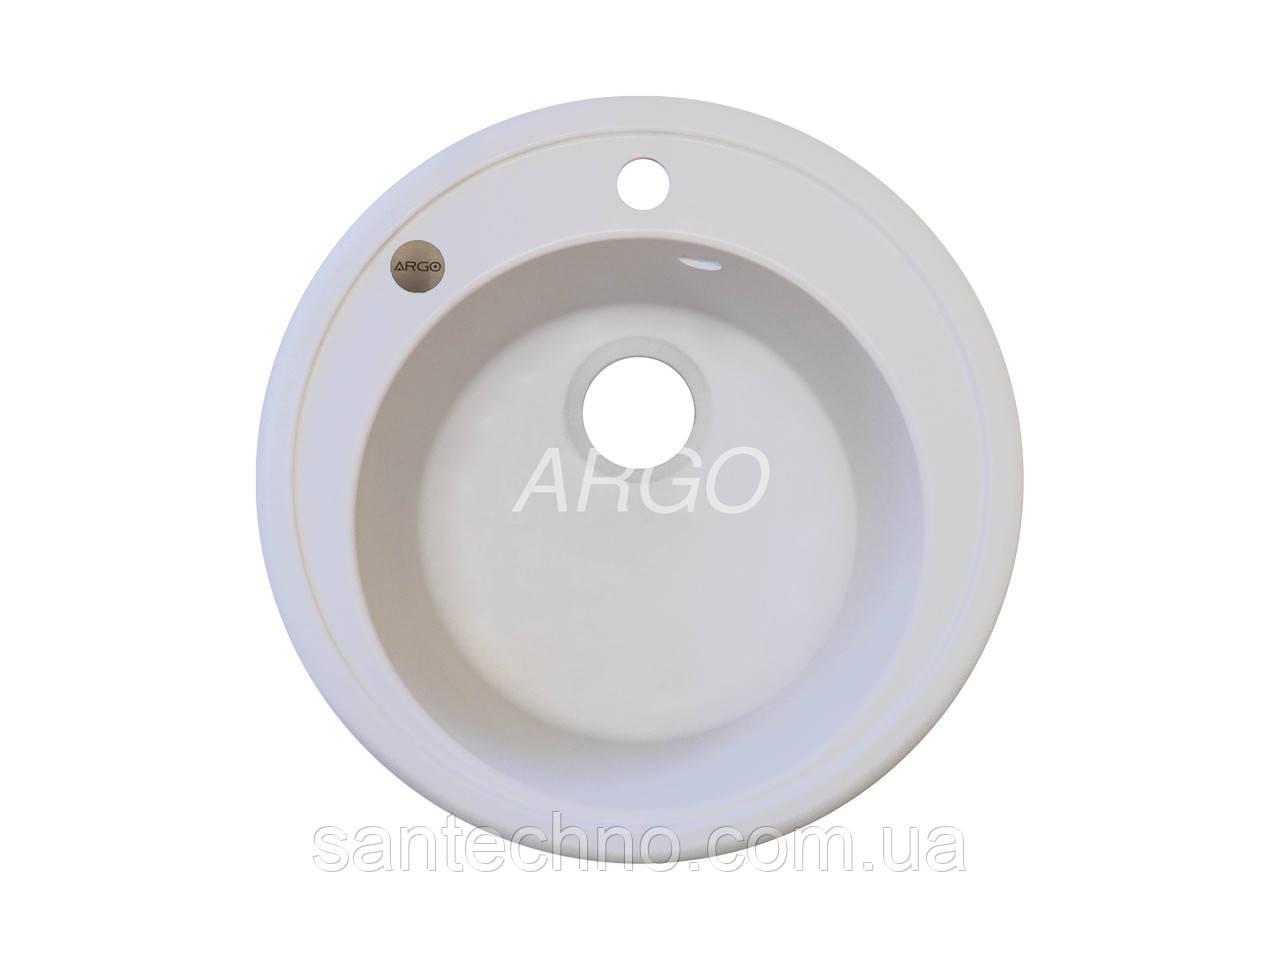 Гранітна біла мийка для кухні Argo Tondo White 510*200